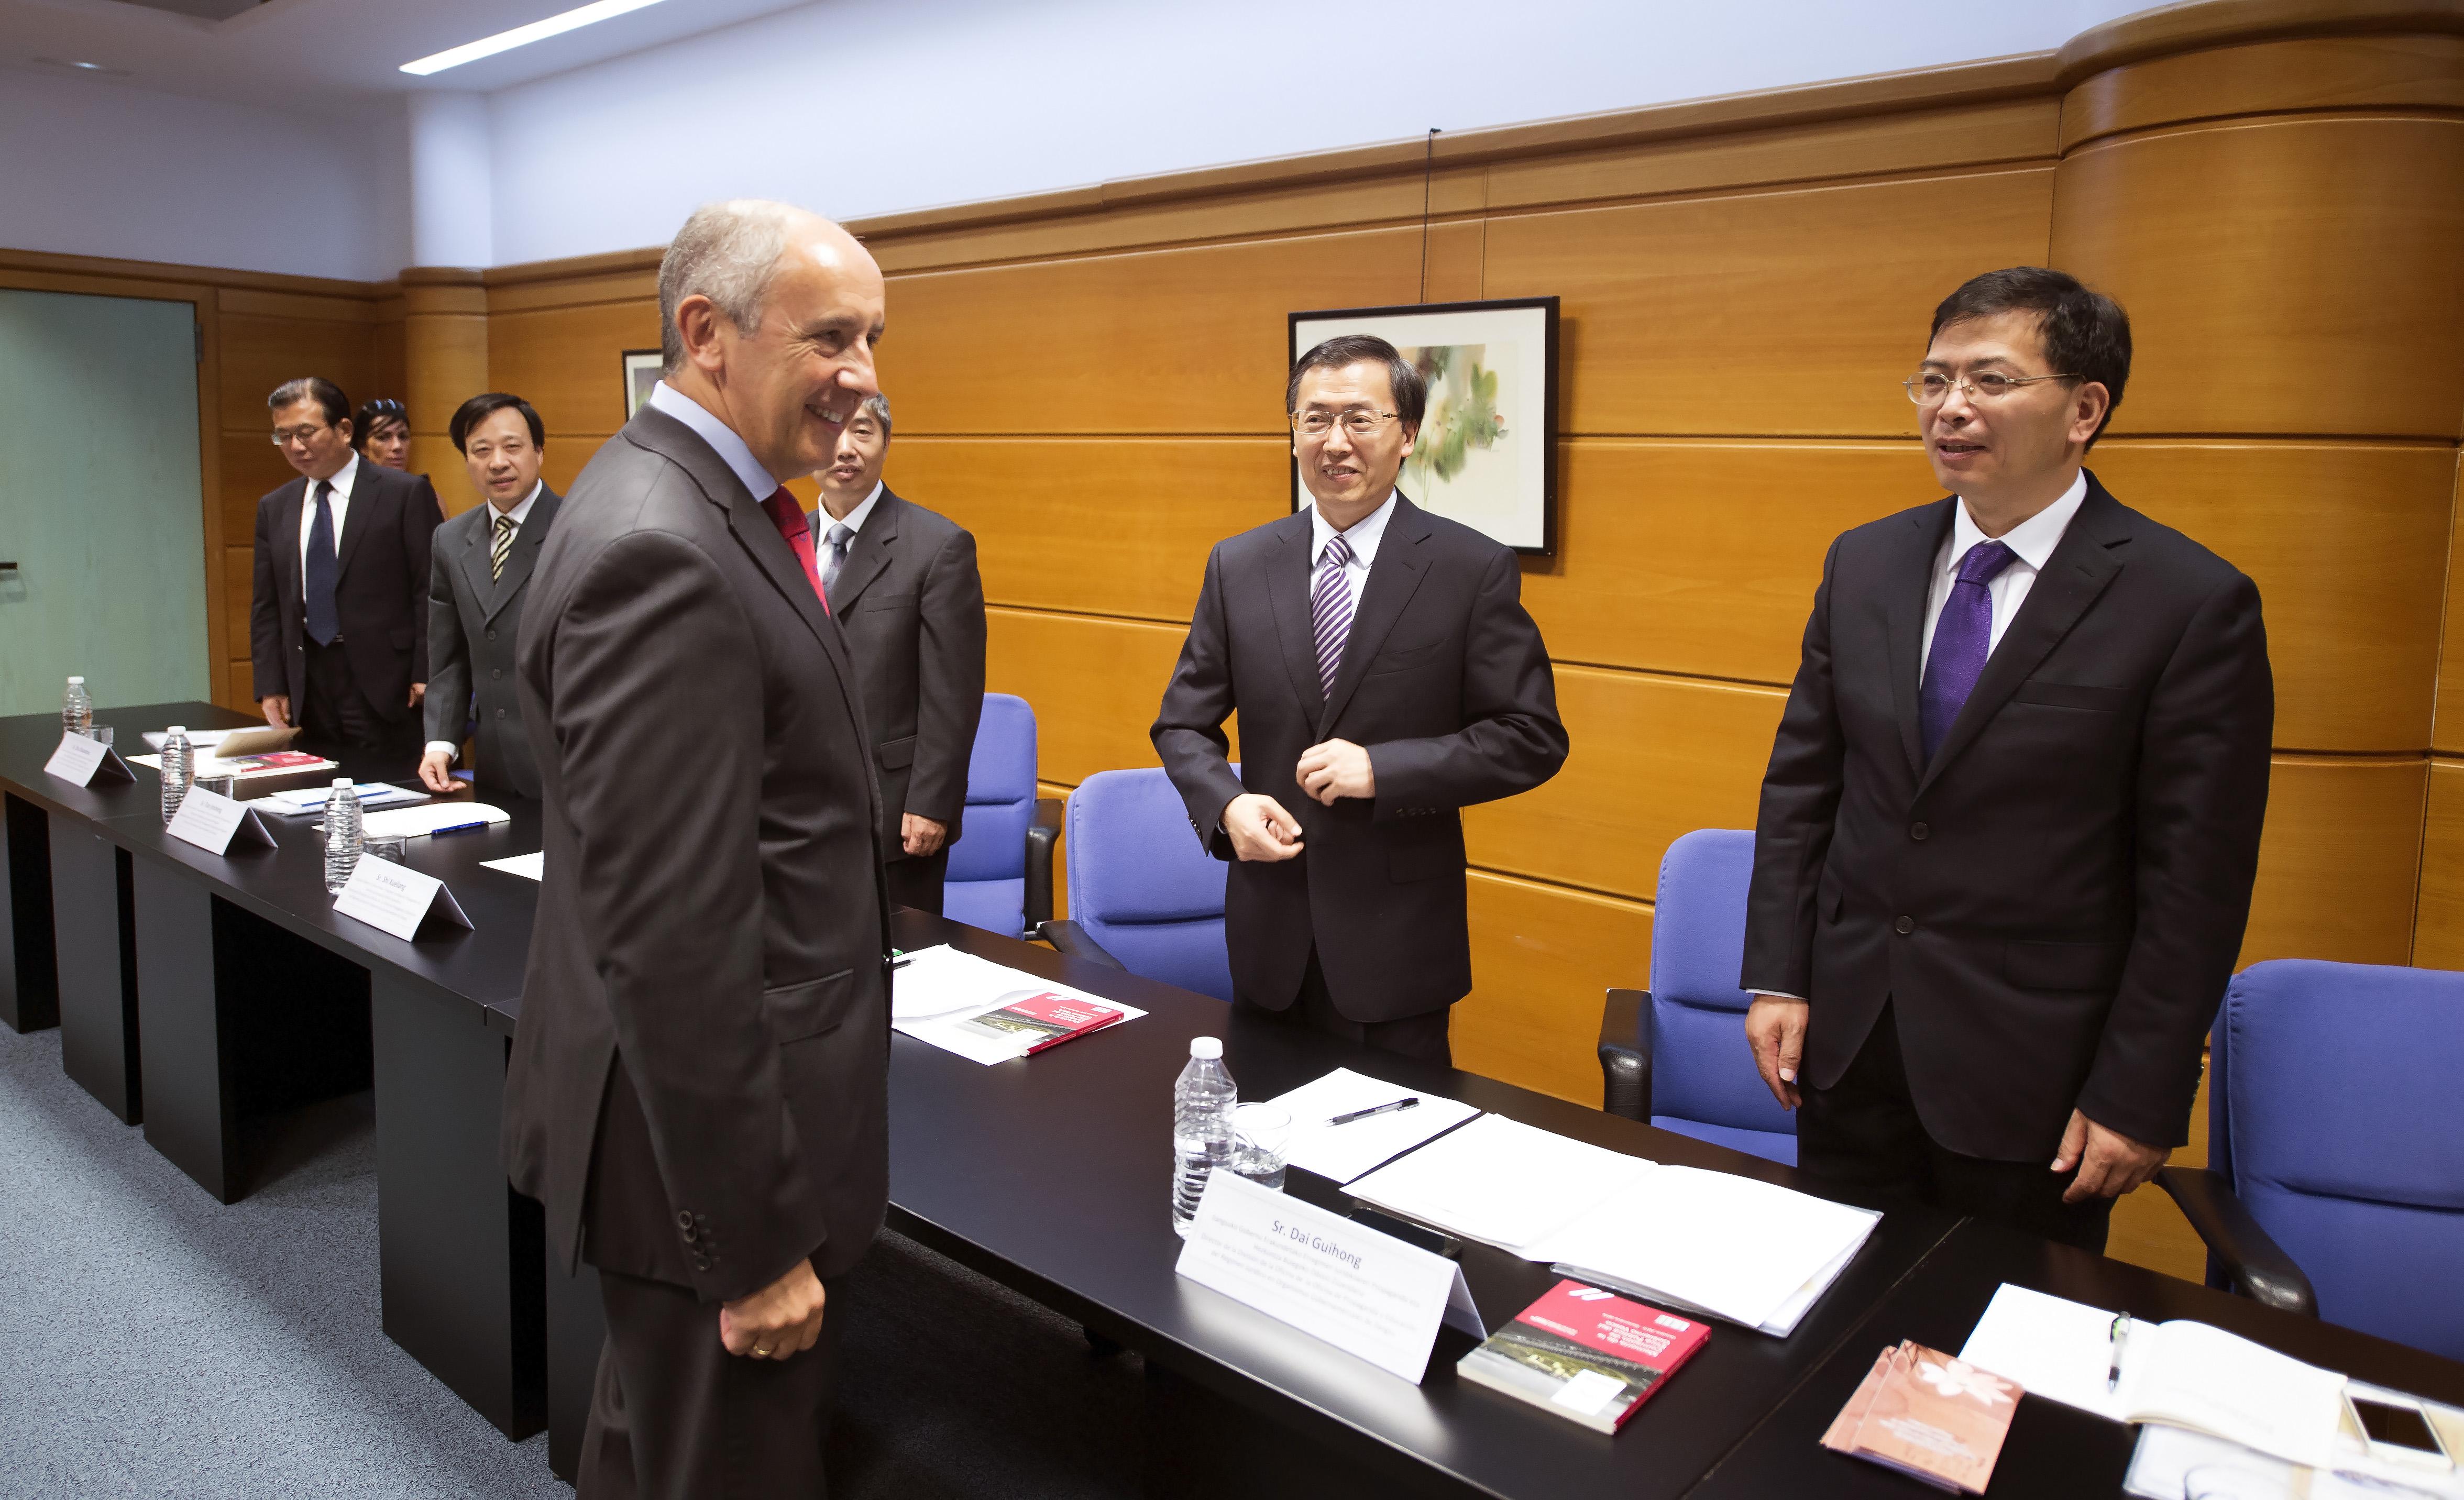 2015_09_09_erkoreka_delegacion_china_02.jpg